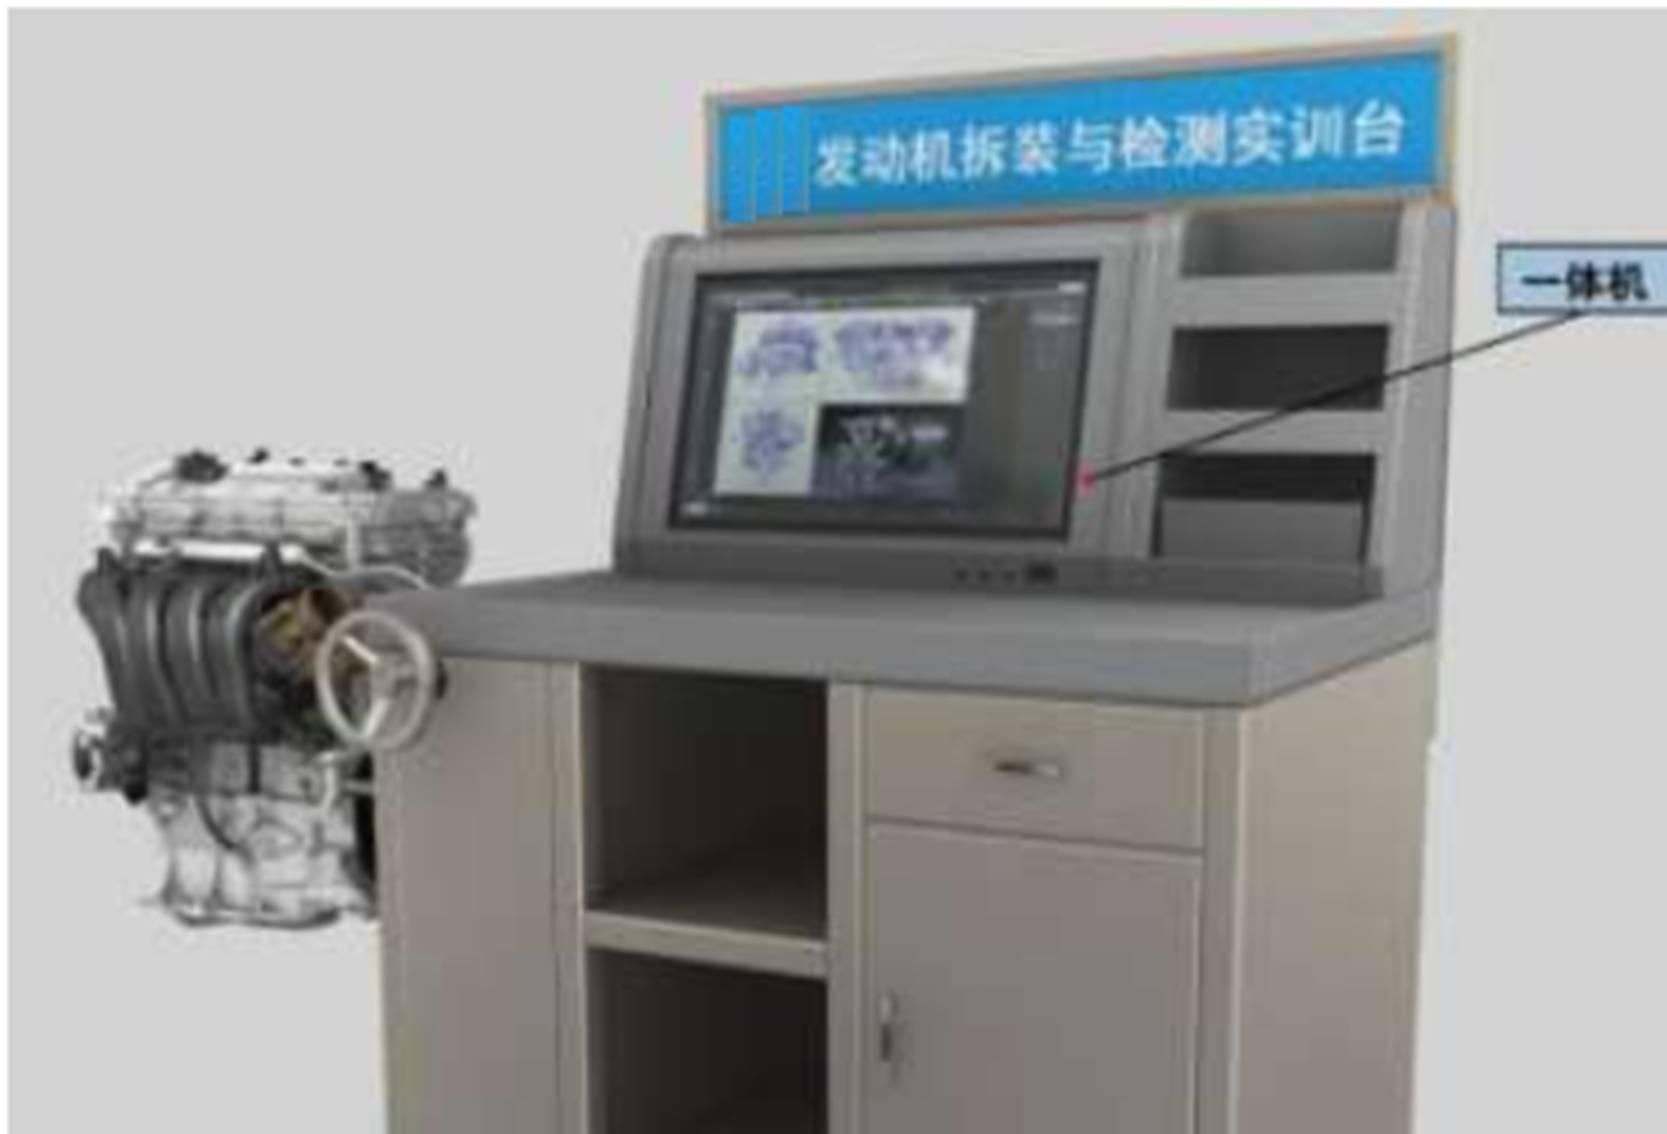 YUY-FZ02汽车发动机拆装与检测实训台